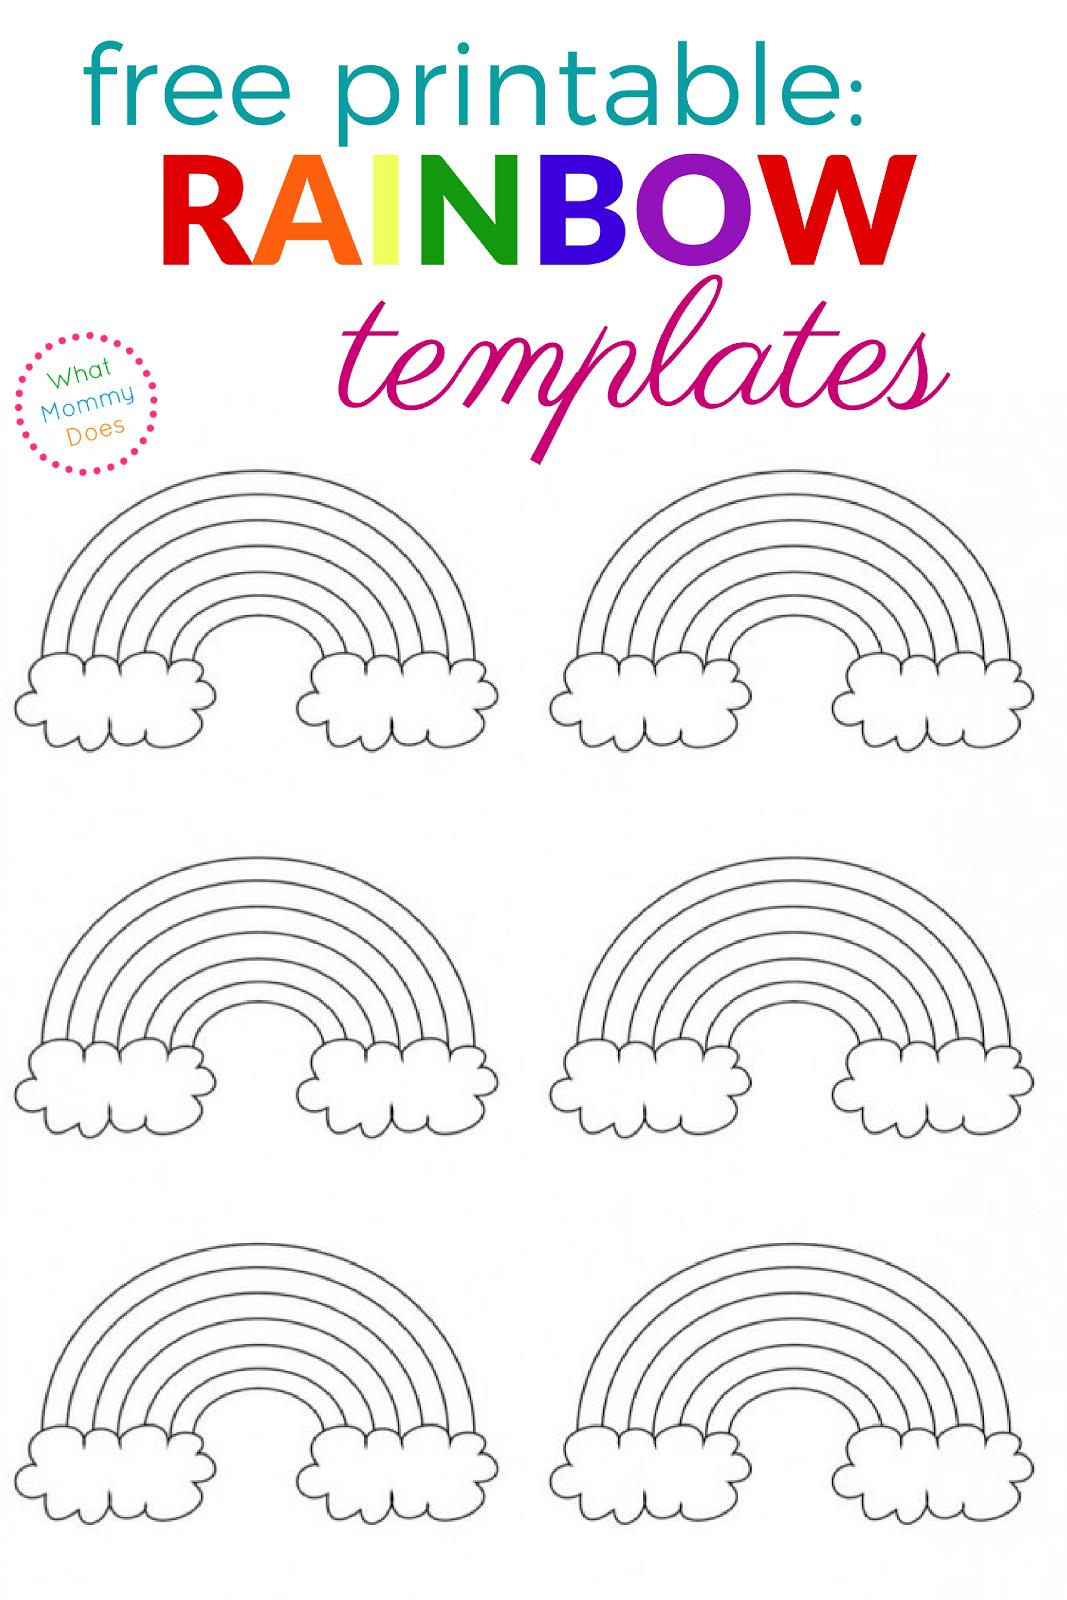 Free Printable Rainbow Templates – Large, Medium & Small Patterns - Free Printable Crafts